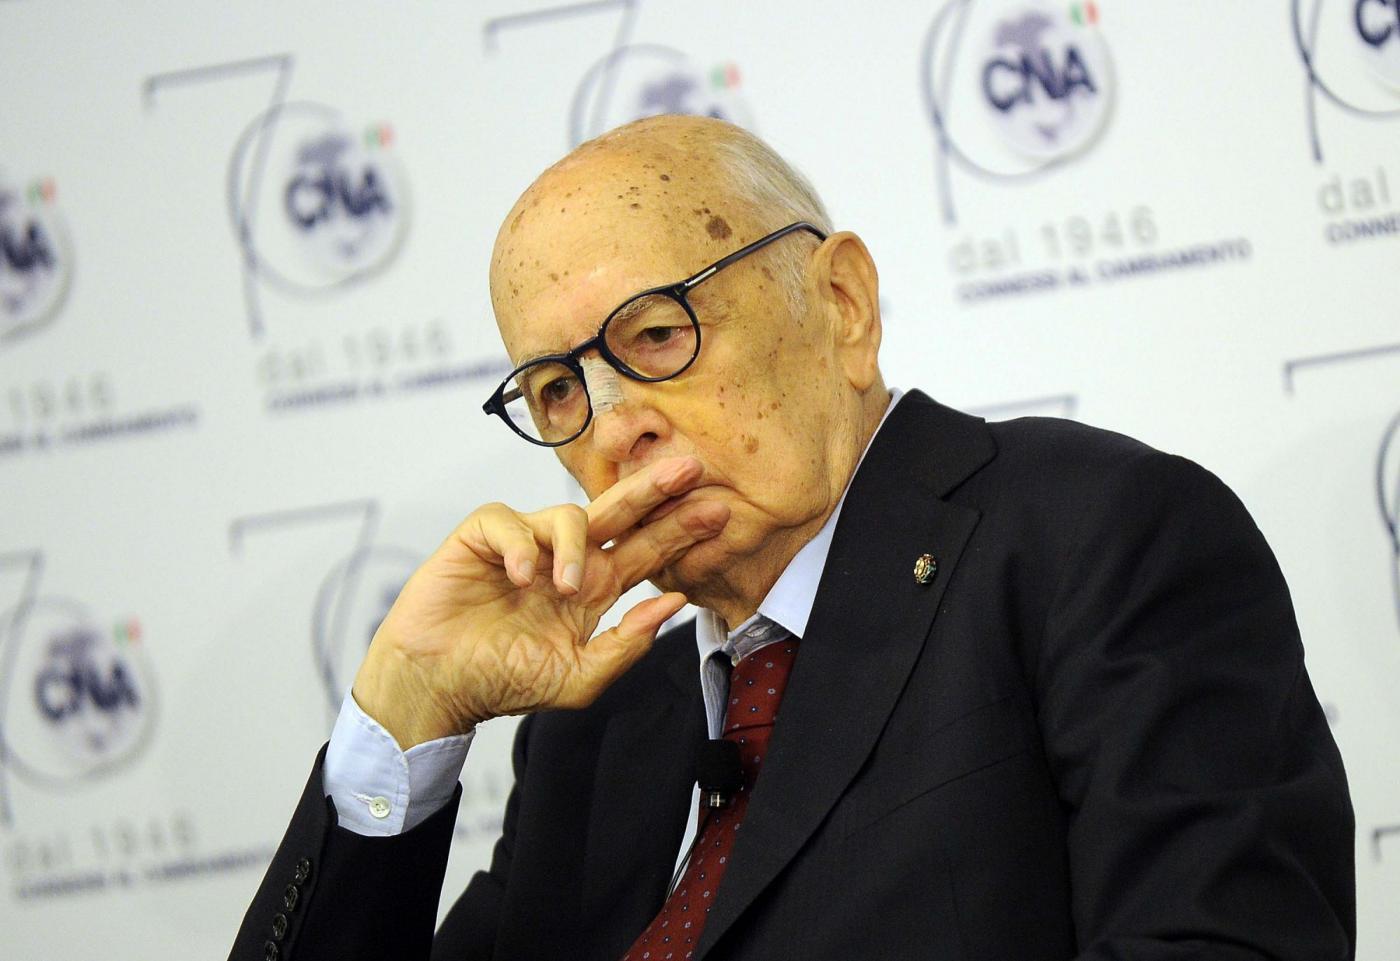 Riforme, Napolitano: basta guerra su referendum, ma Italicum va cambiato